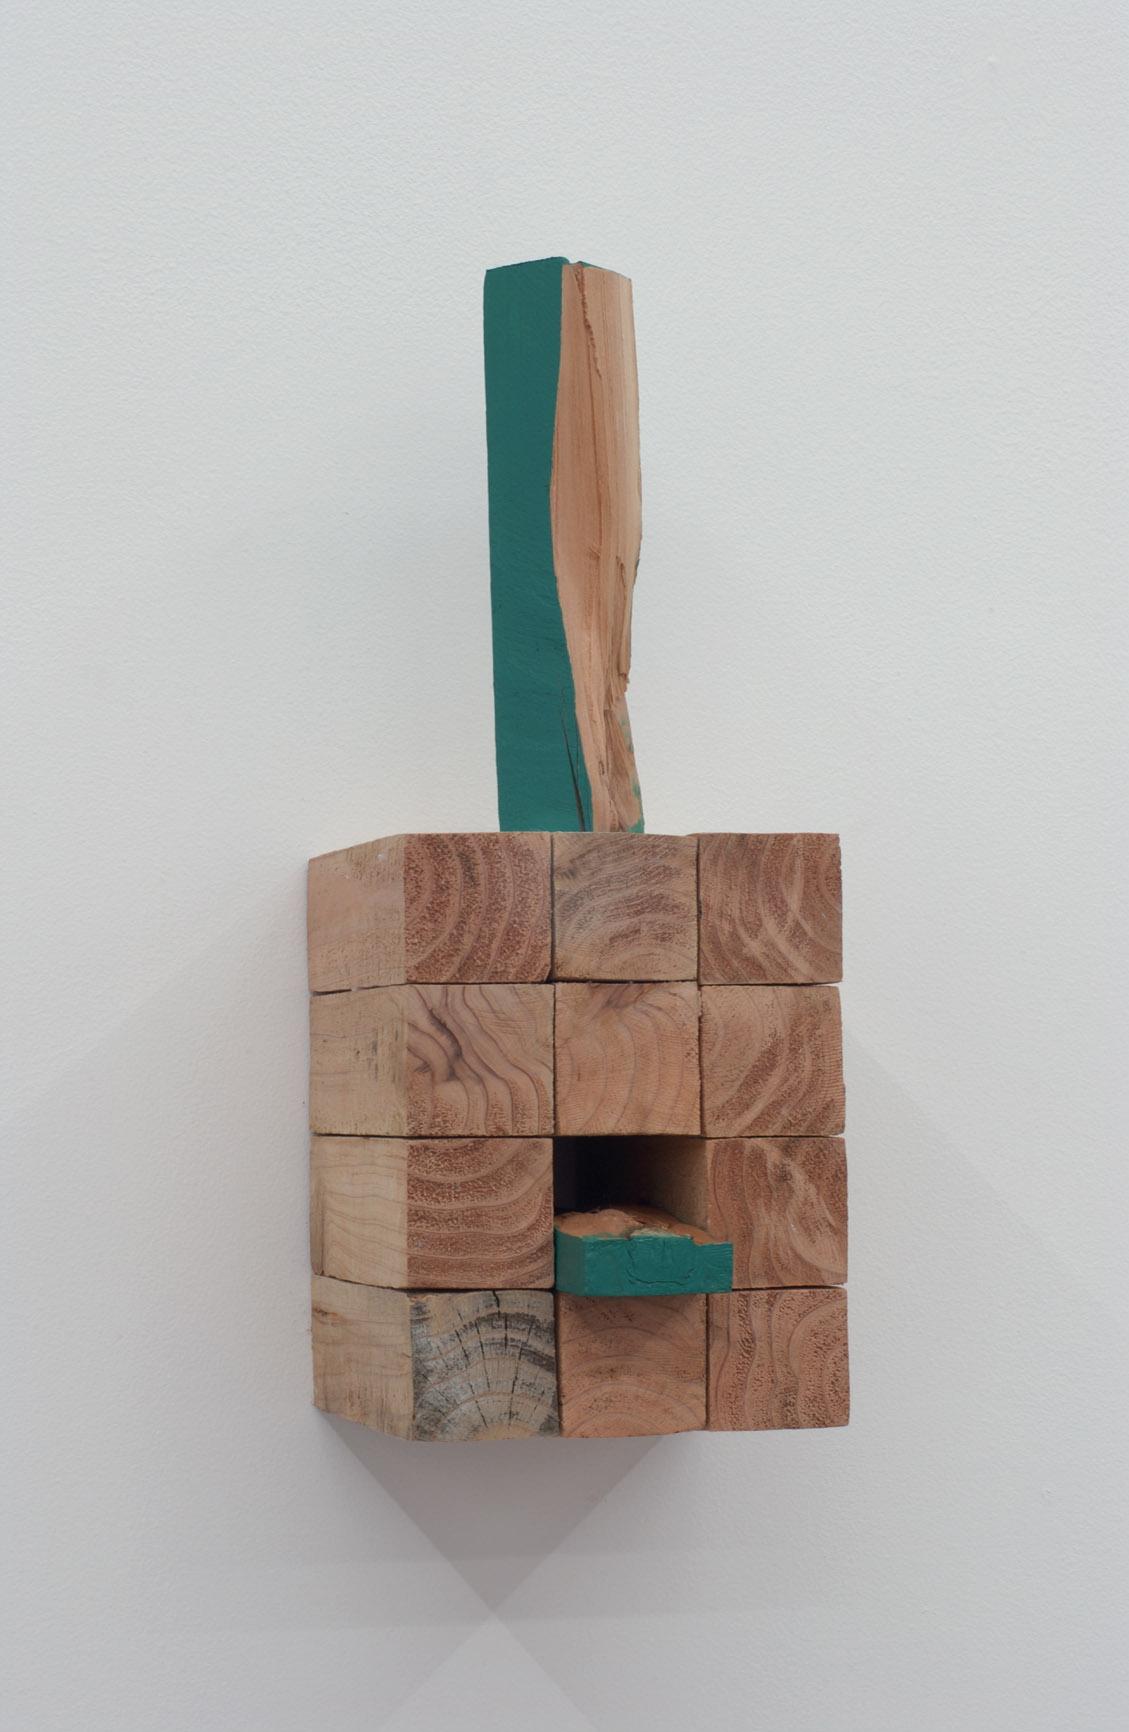 Polysemy , 2006 多義性 ( Tagisei ) Wood, water-based paint 14 1/8 x 5 3/8 x 5 7/8 inches 36 x 13.5 x 15 cm